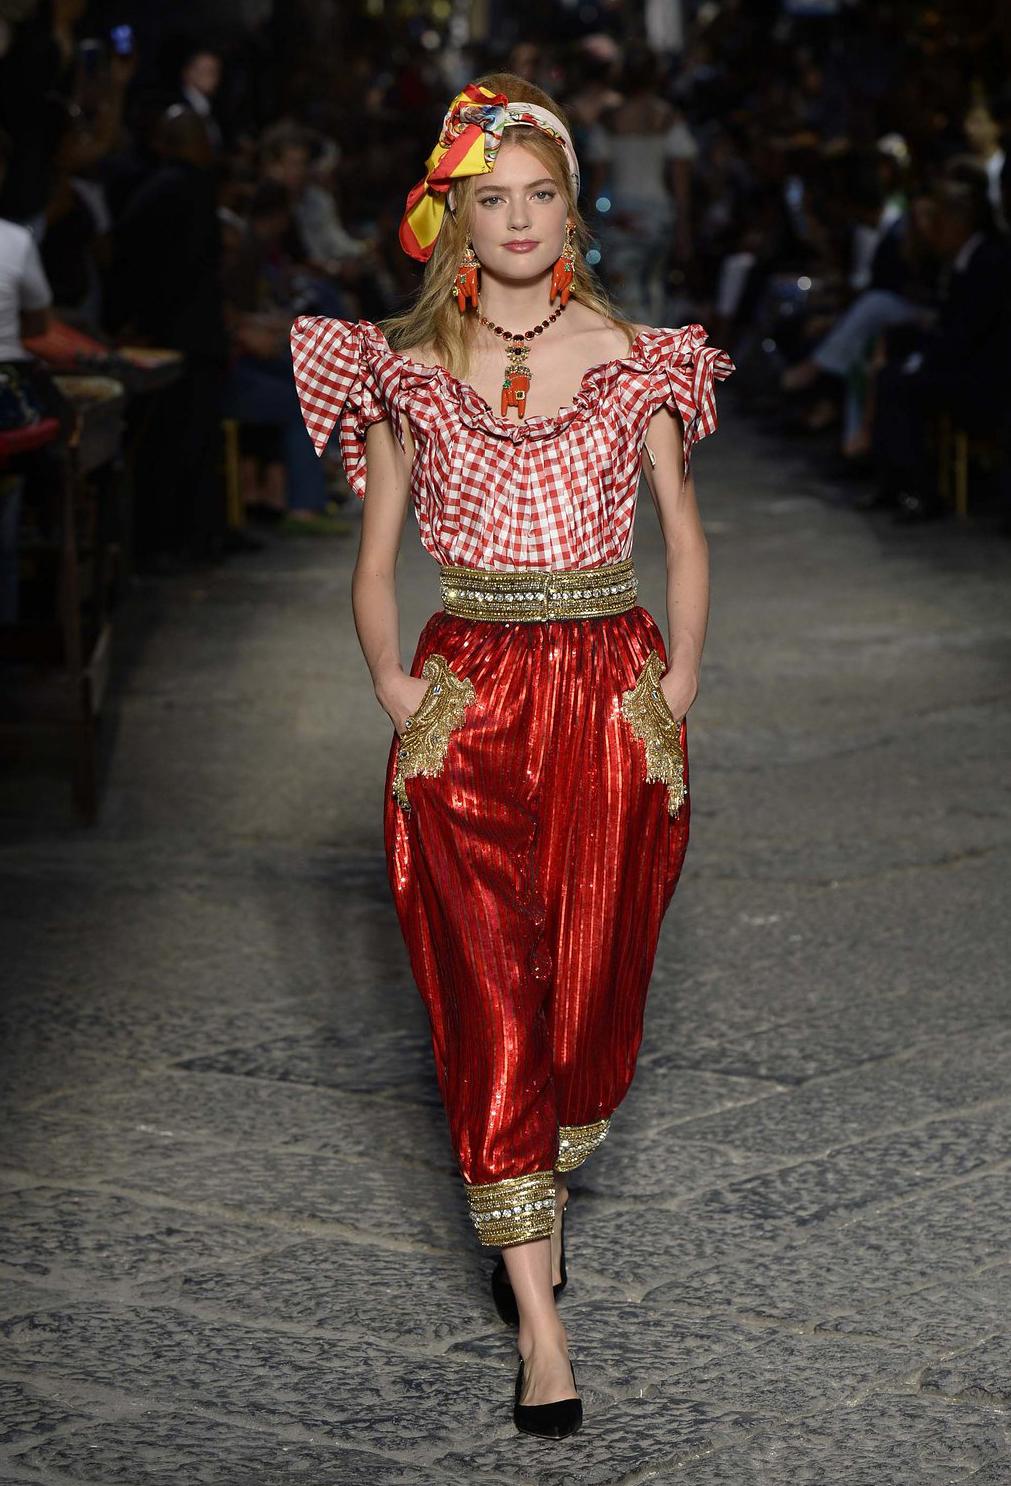 Fashion Moda Penélope Cruz In Vogue June Issue: Dolce & Gabbana Alta Moda 2016 ‹ Fashion Trendsetter